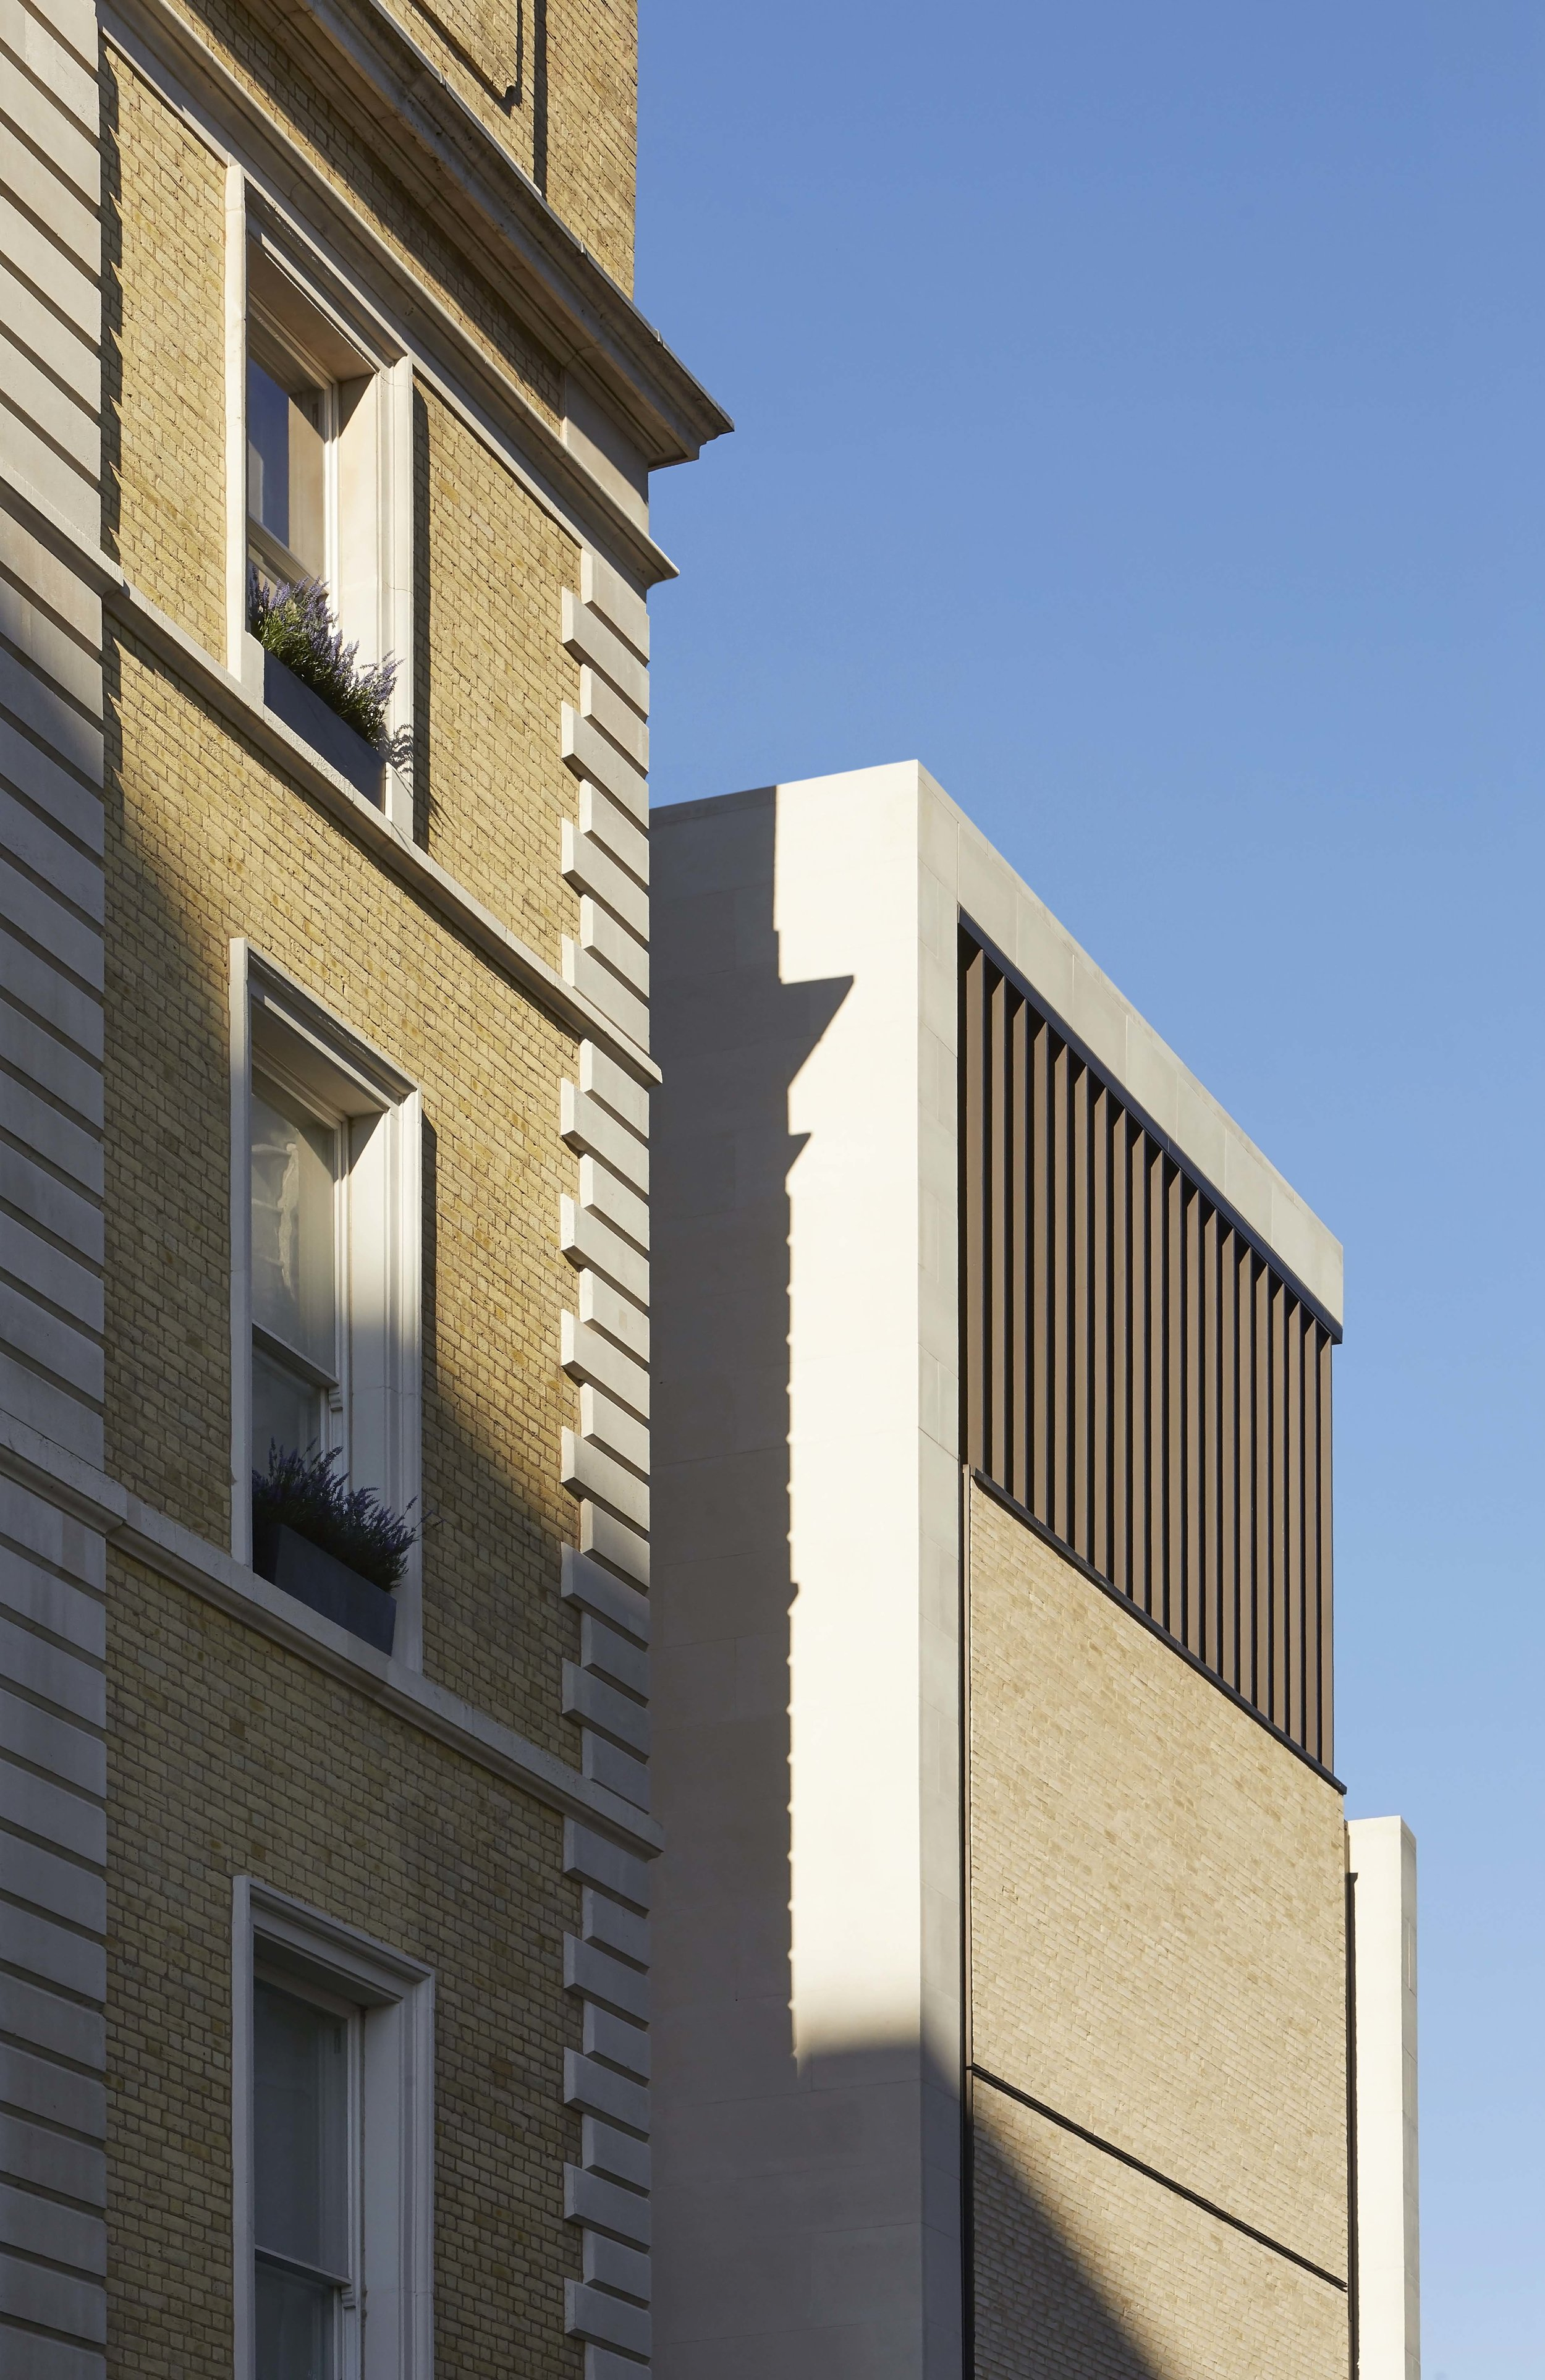 Flanagan Lawrence_Grosvenor Crescent_London_©Hufton+Crow_004.jpg